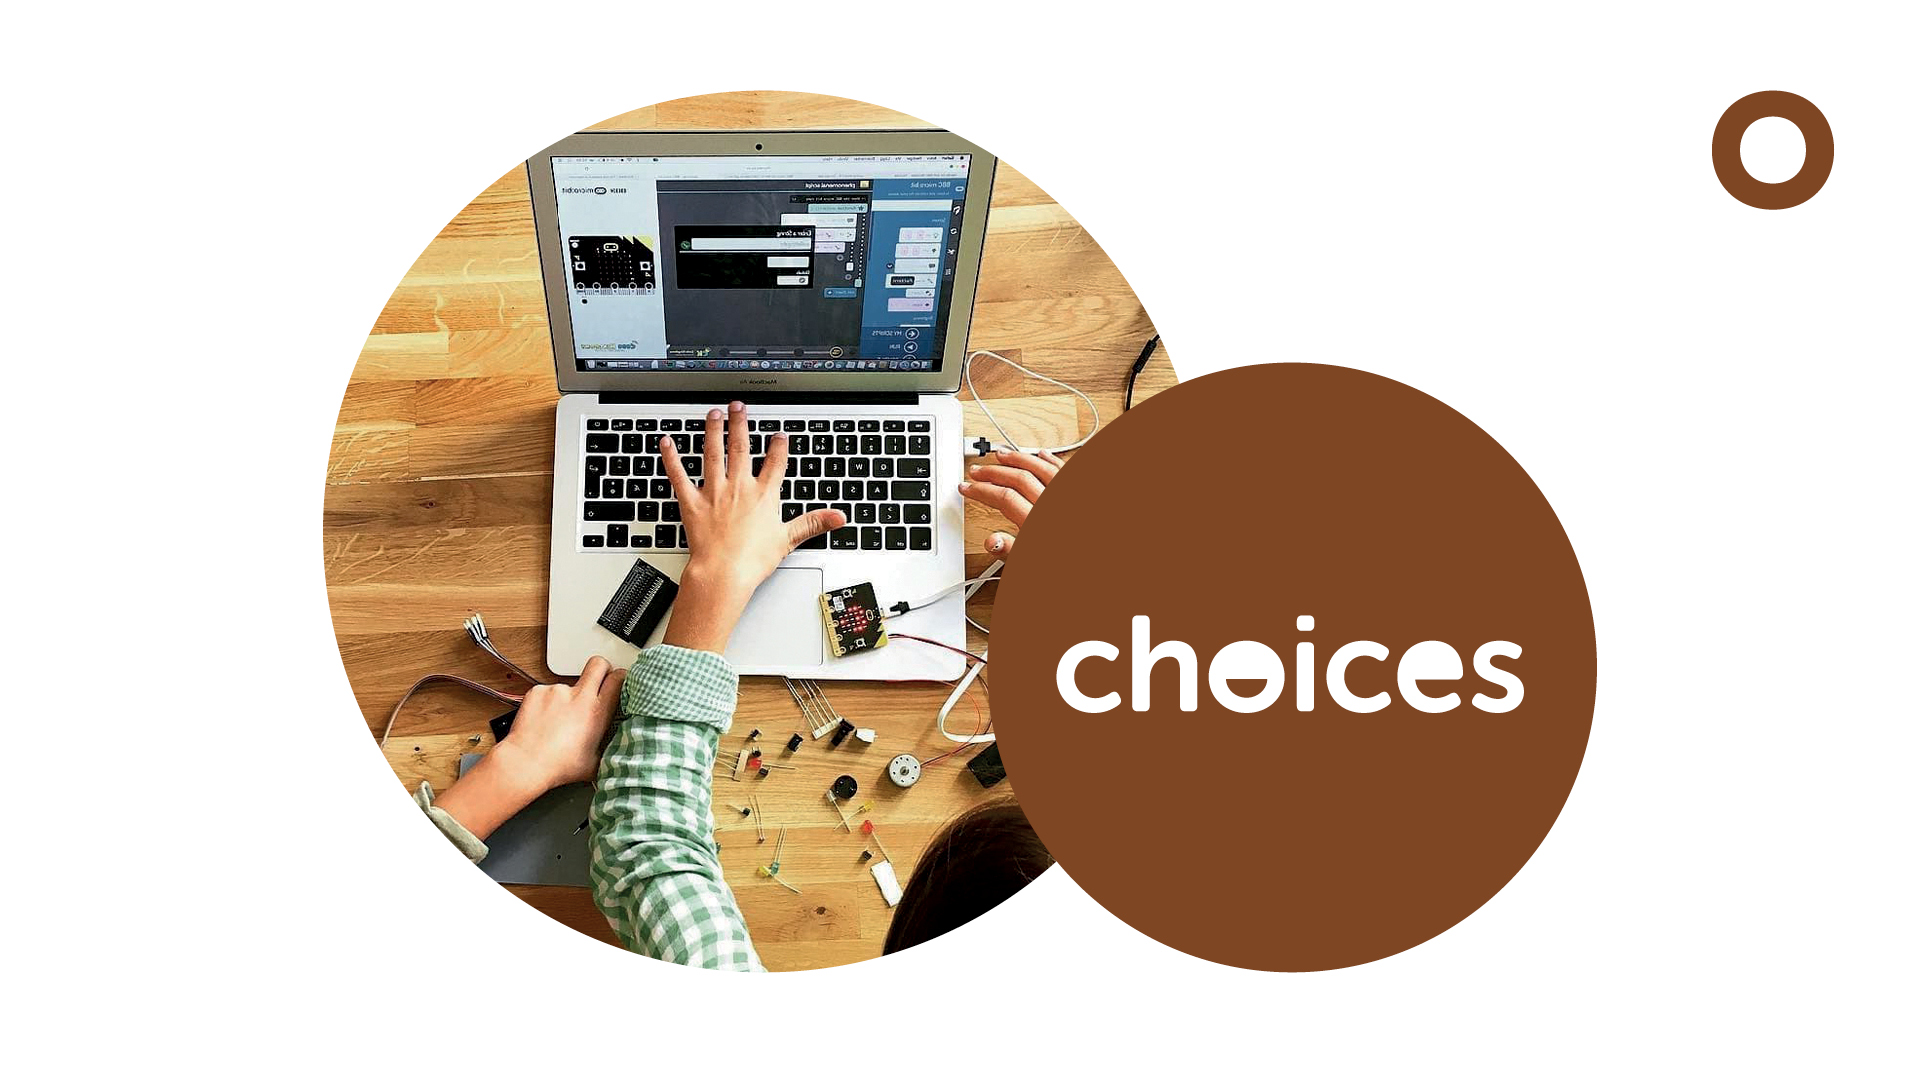 choices 99 ilustračné foto